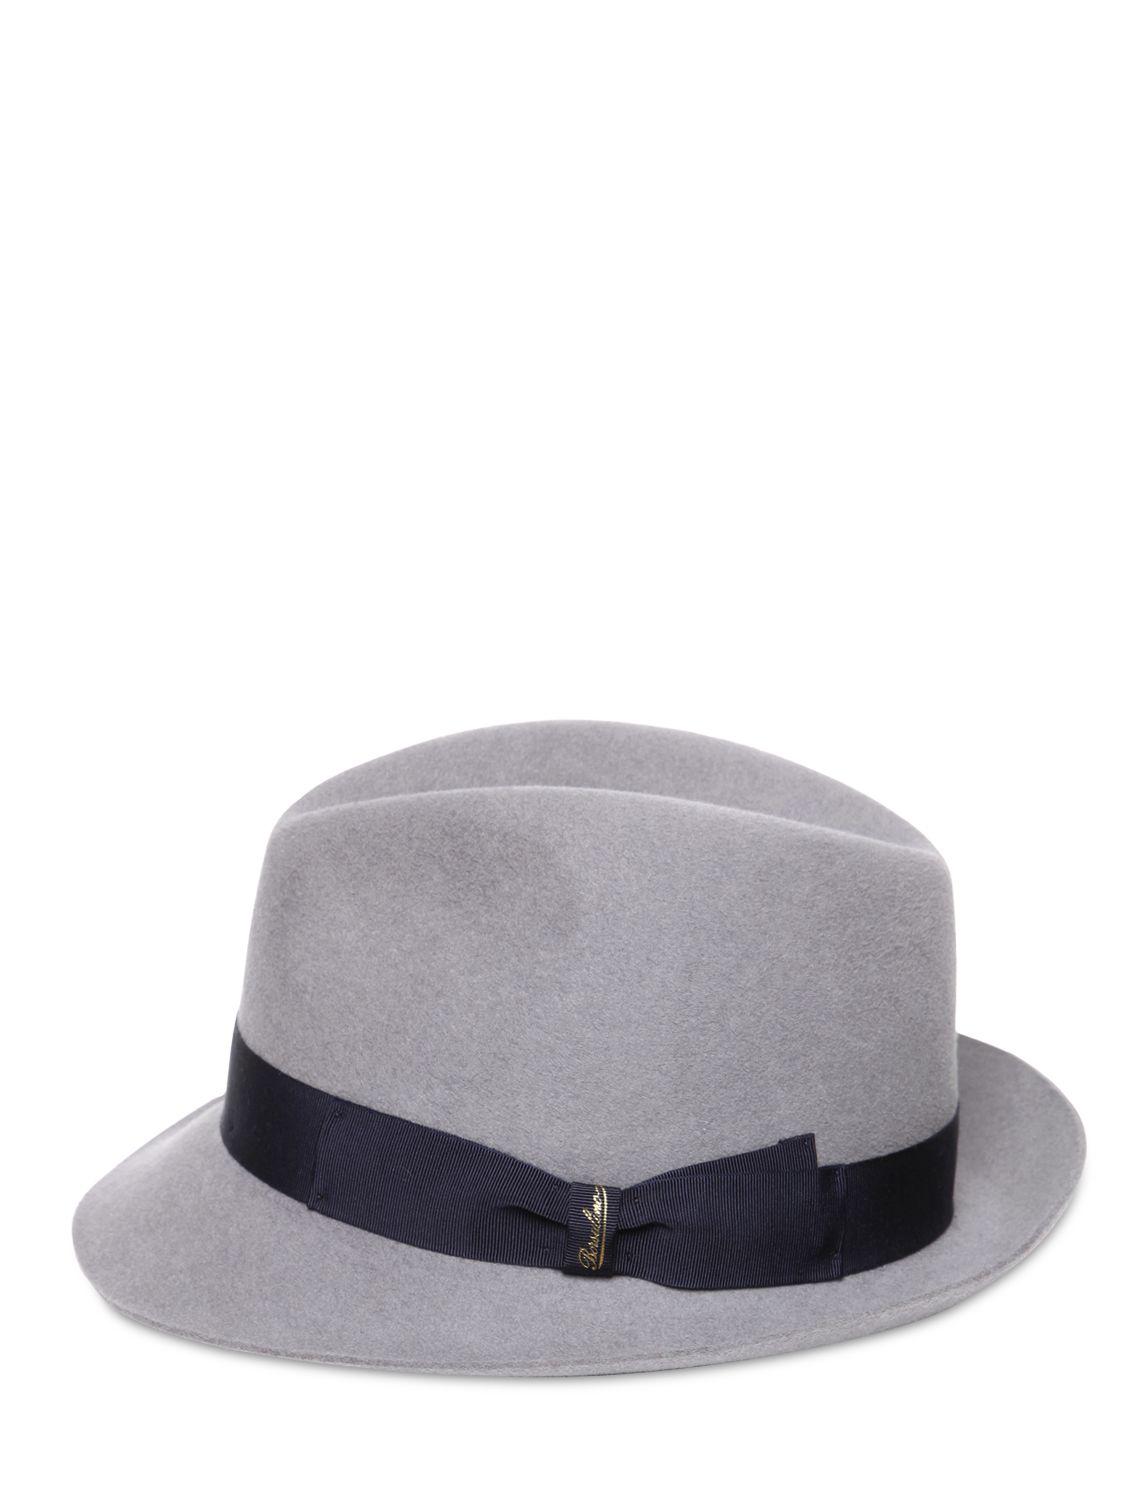 fa4b6c880f6fb Borsalino Lapin Fur Felt Trilby Hat in Gray - Lyst